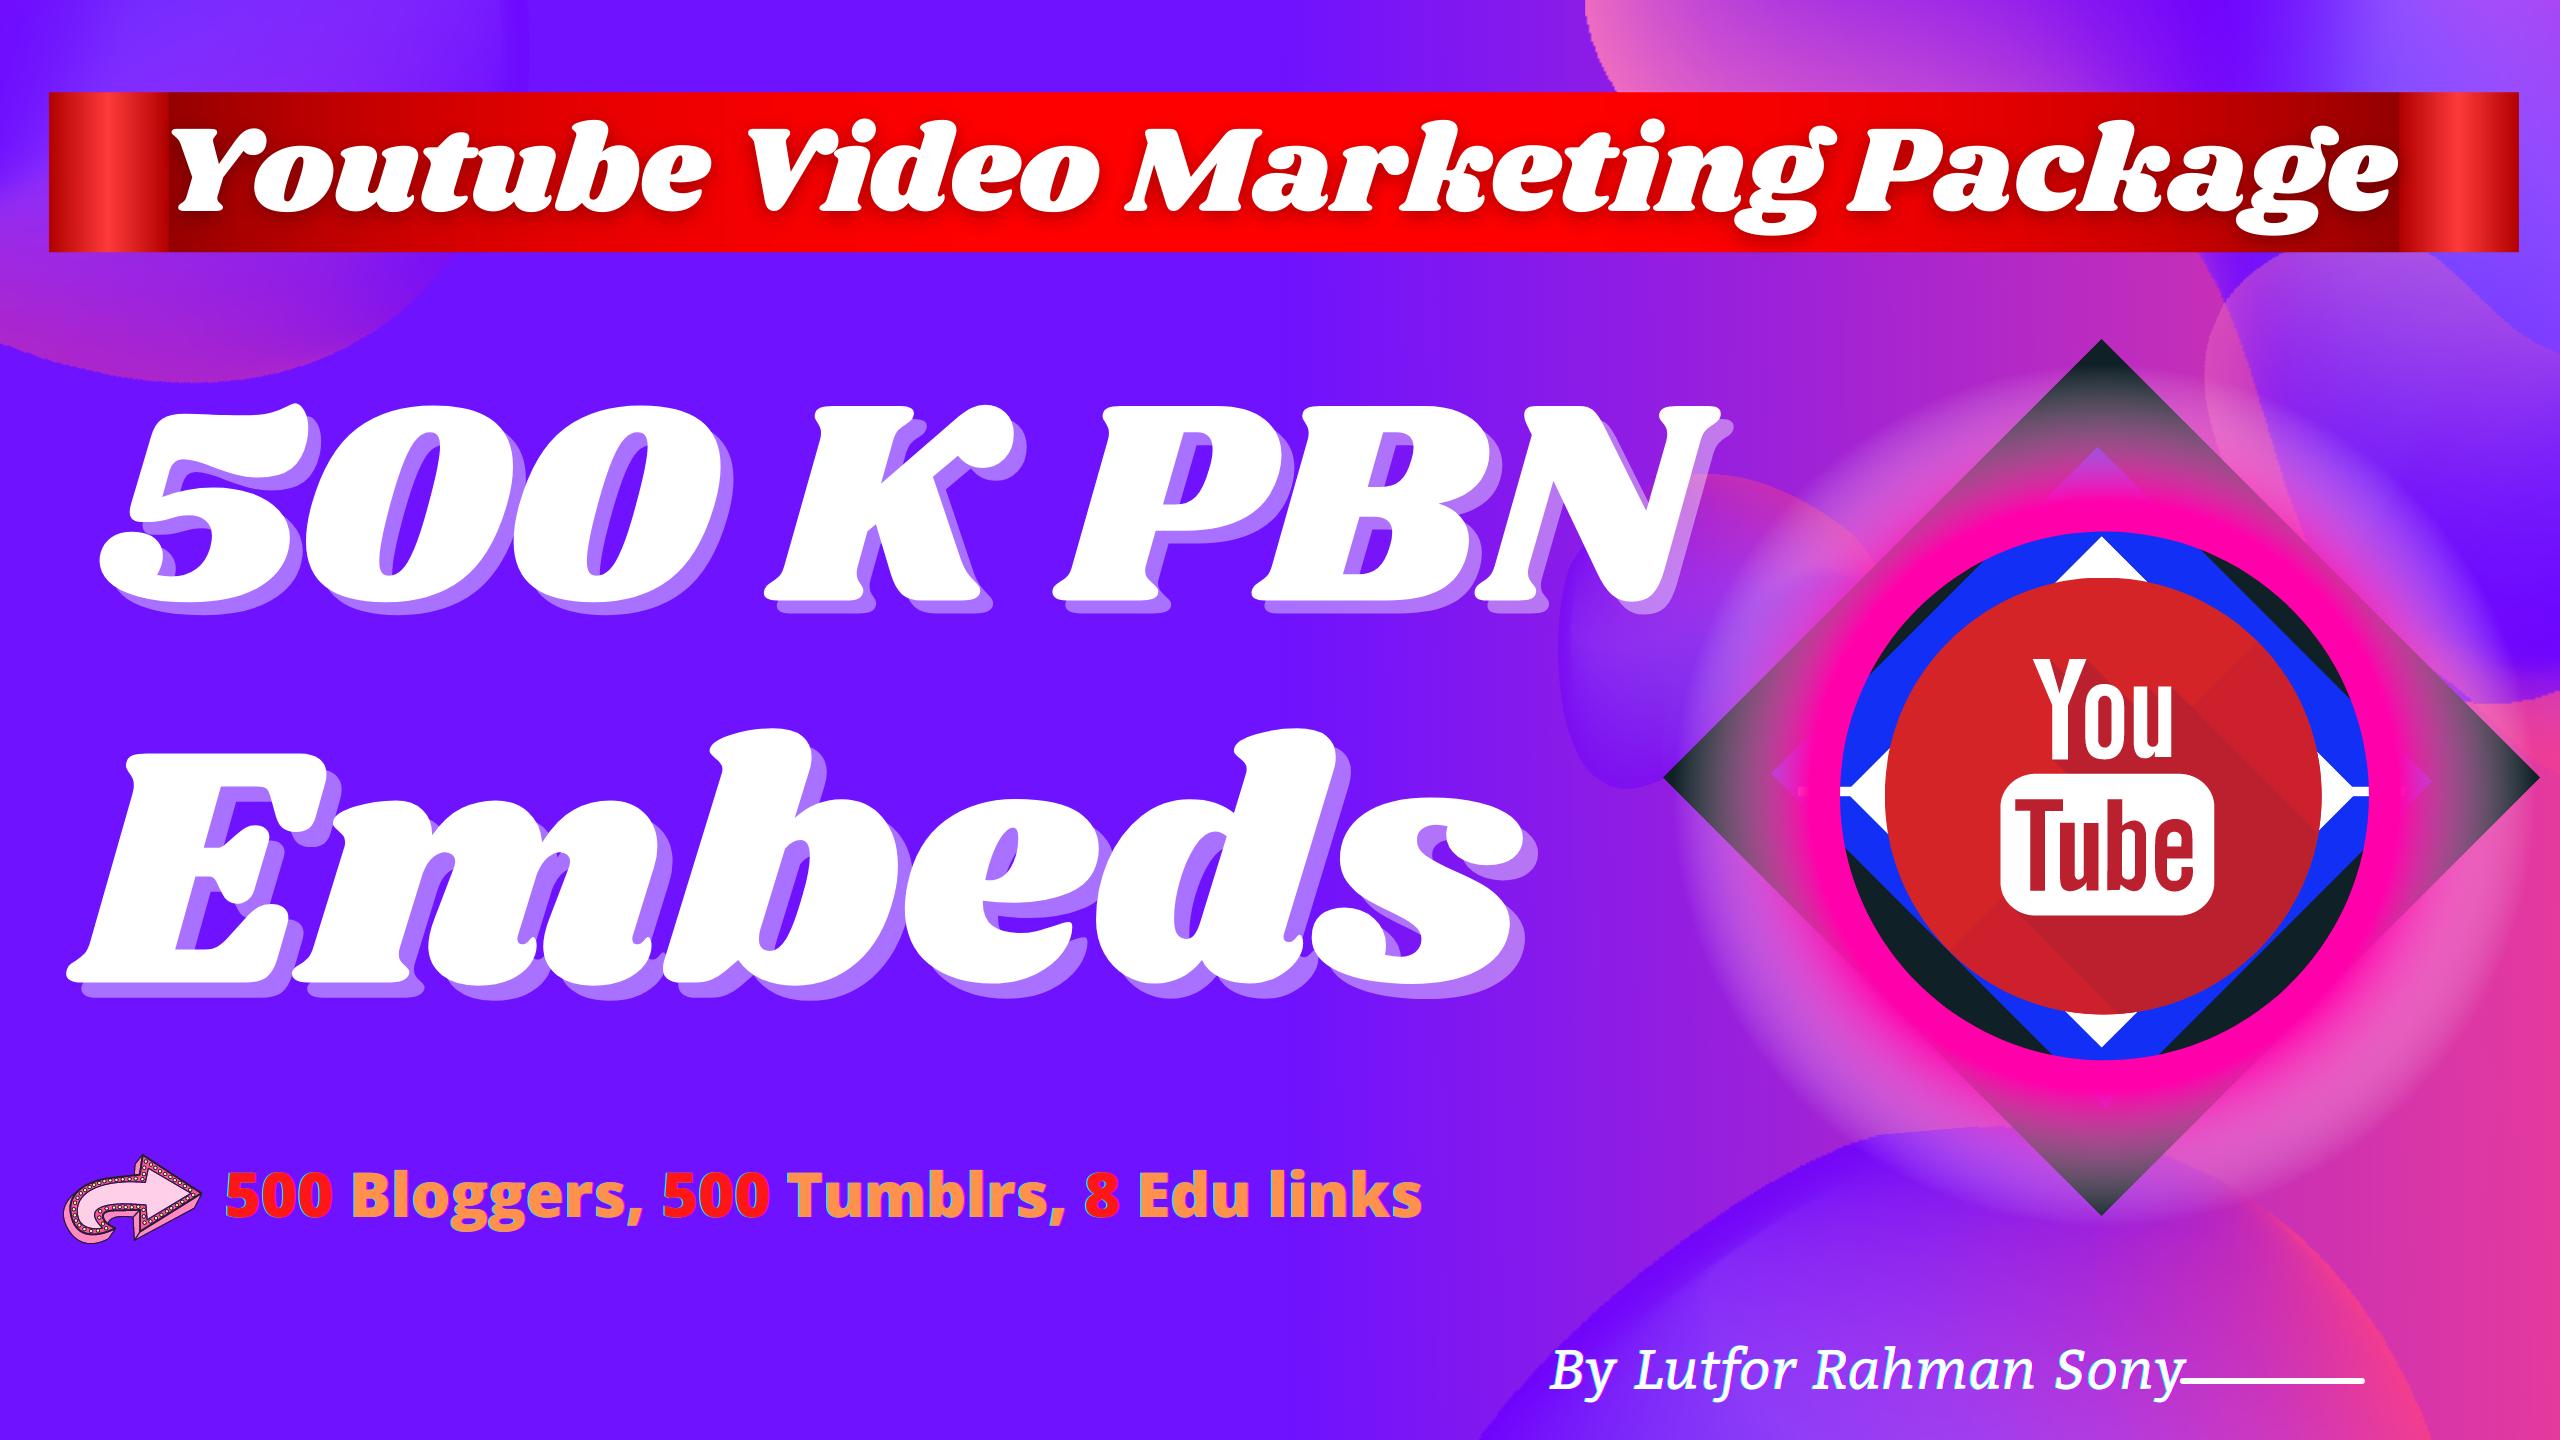 Video Marketing - 500K PBN YouTube Video Embeds + 500 Blogger,  500 Tumblr & EDU backlinks